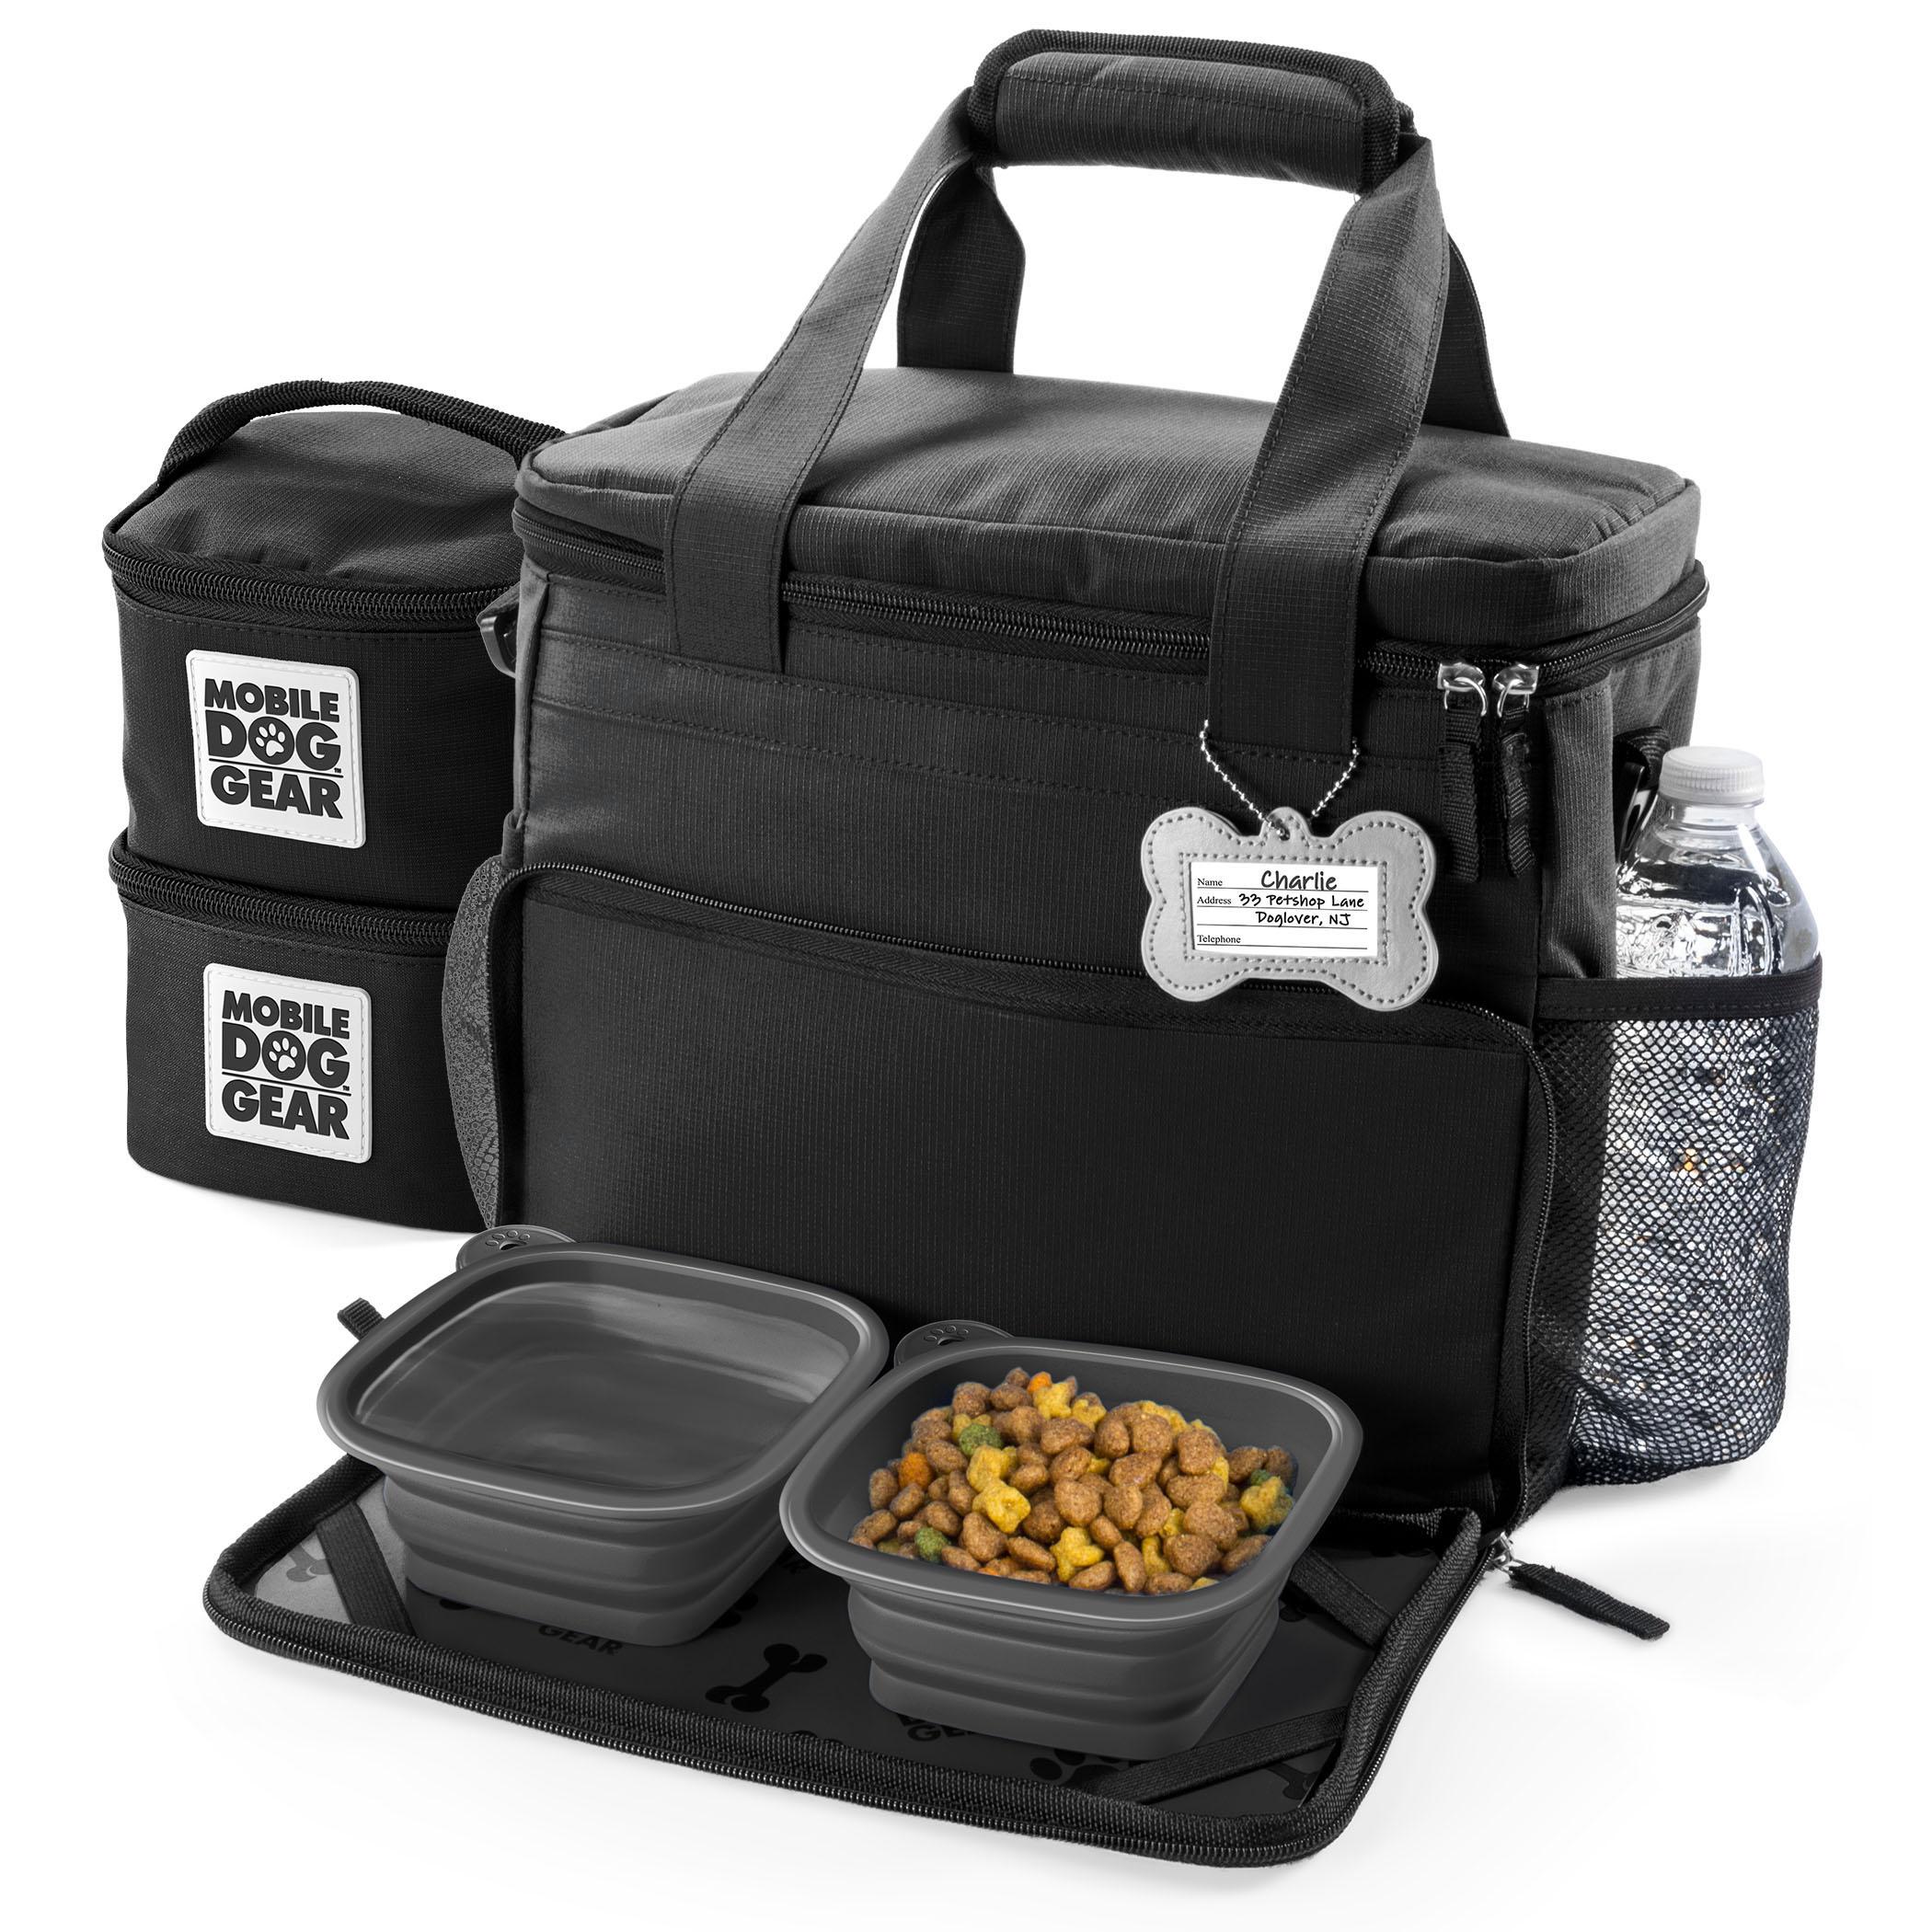 5 - SM Week Away - beauty shot bag and food carriers closed - no dog.jpg